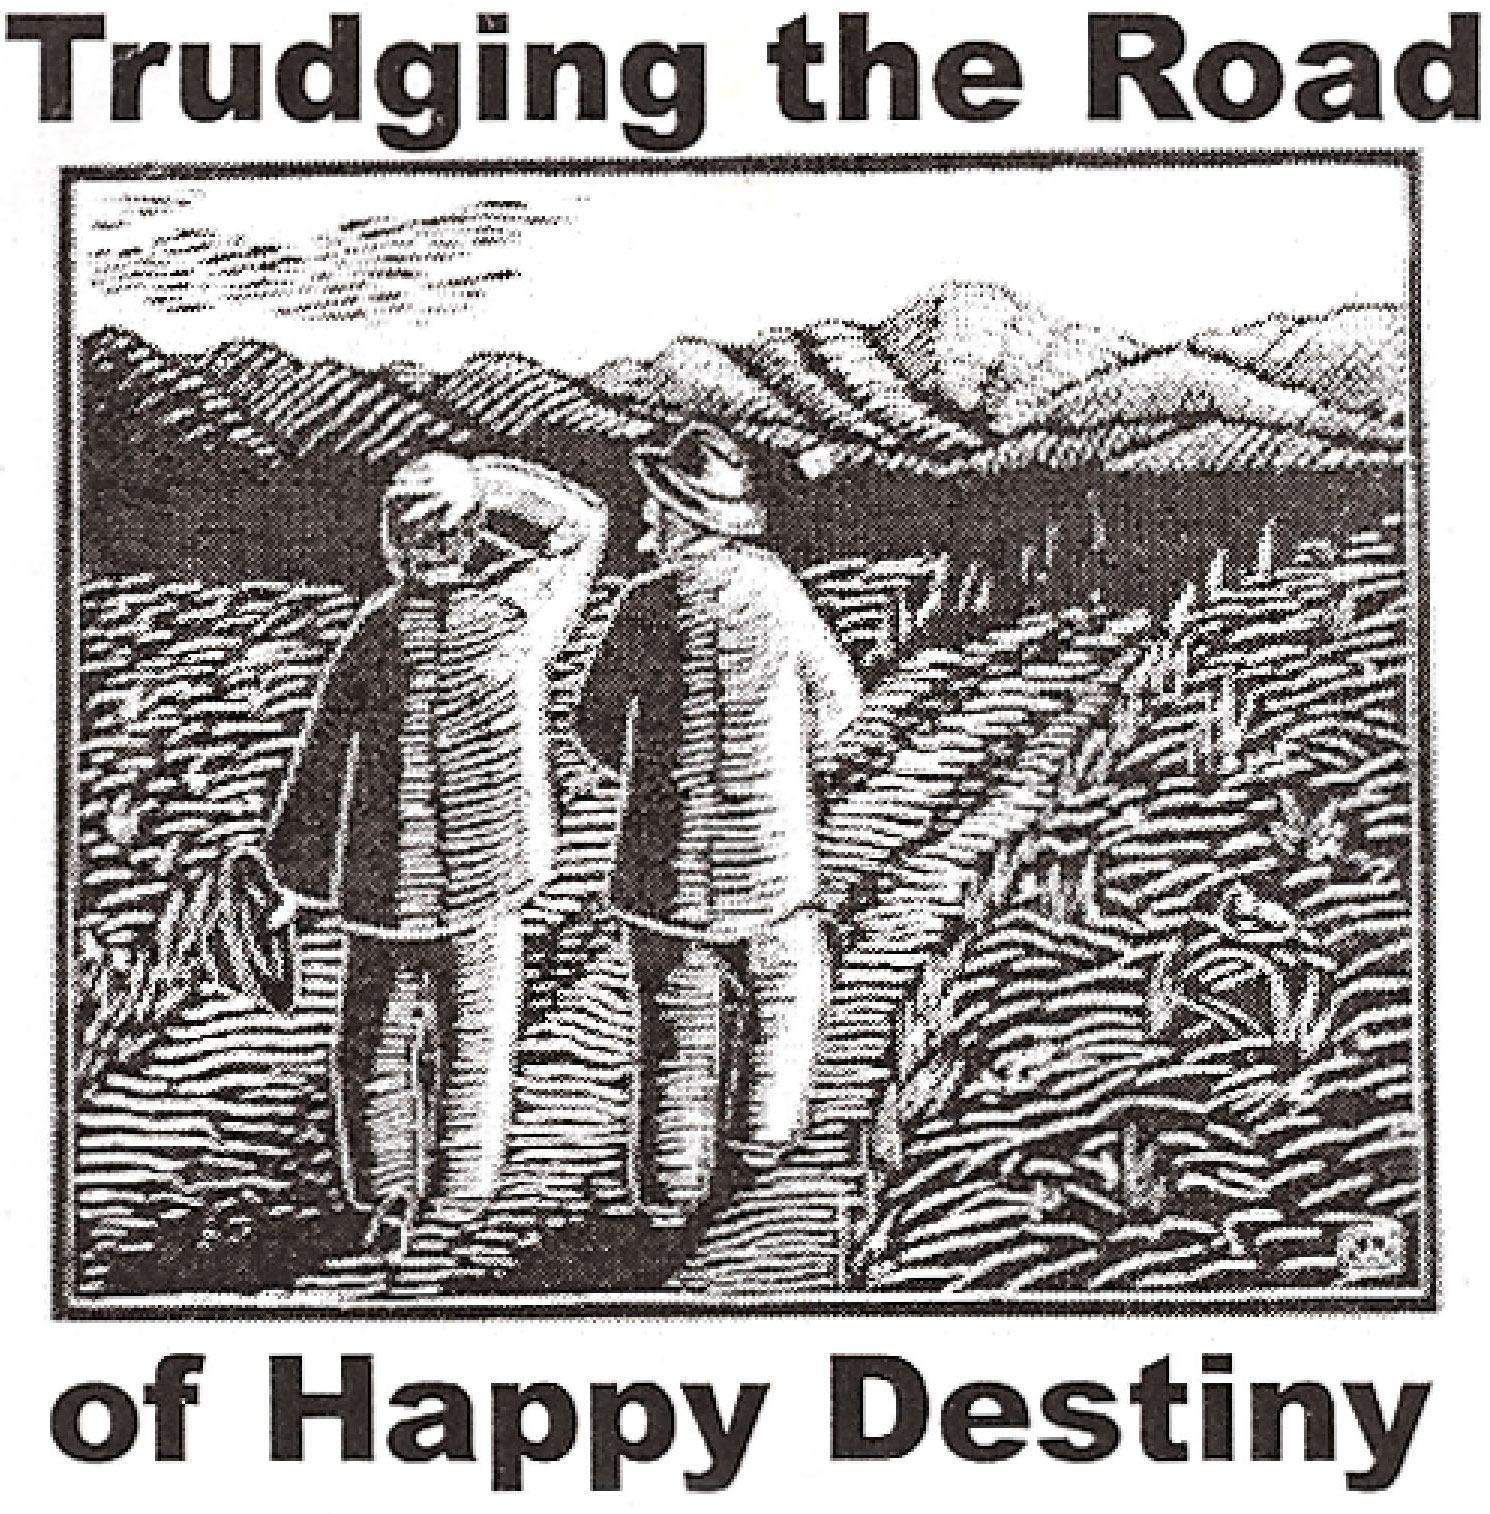 Trudge The Road to Happy Destiny